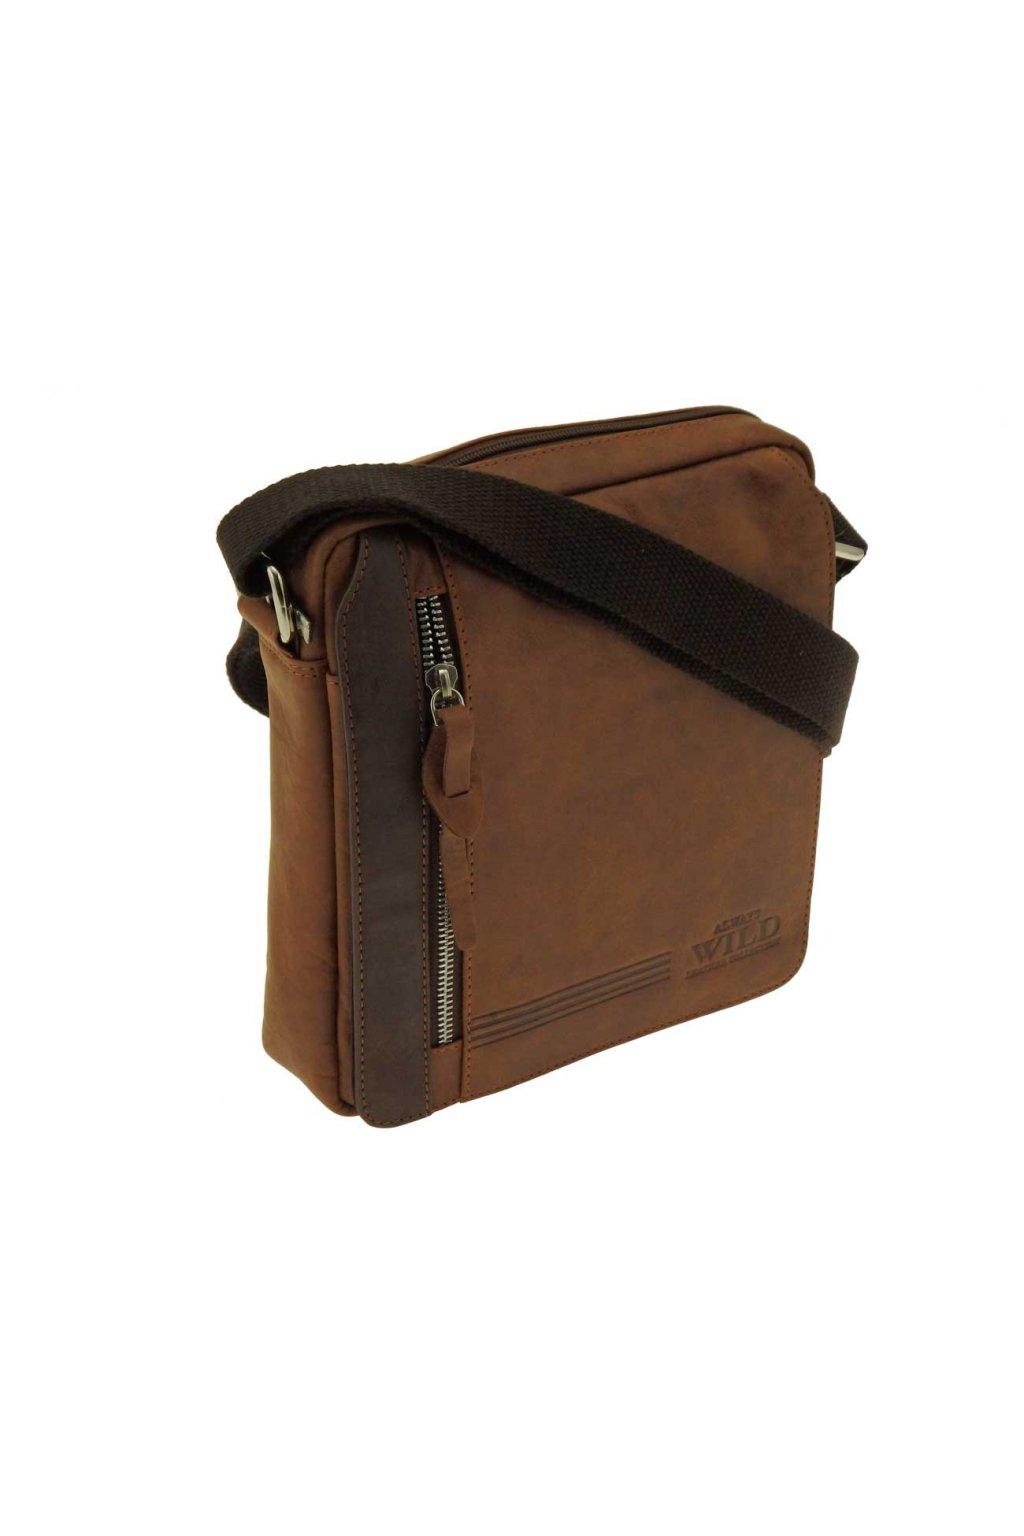 panska kozena taska pres rameno hneda TK10 BAG 3 HB